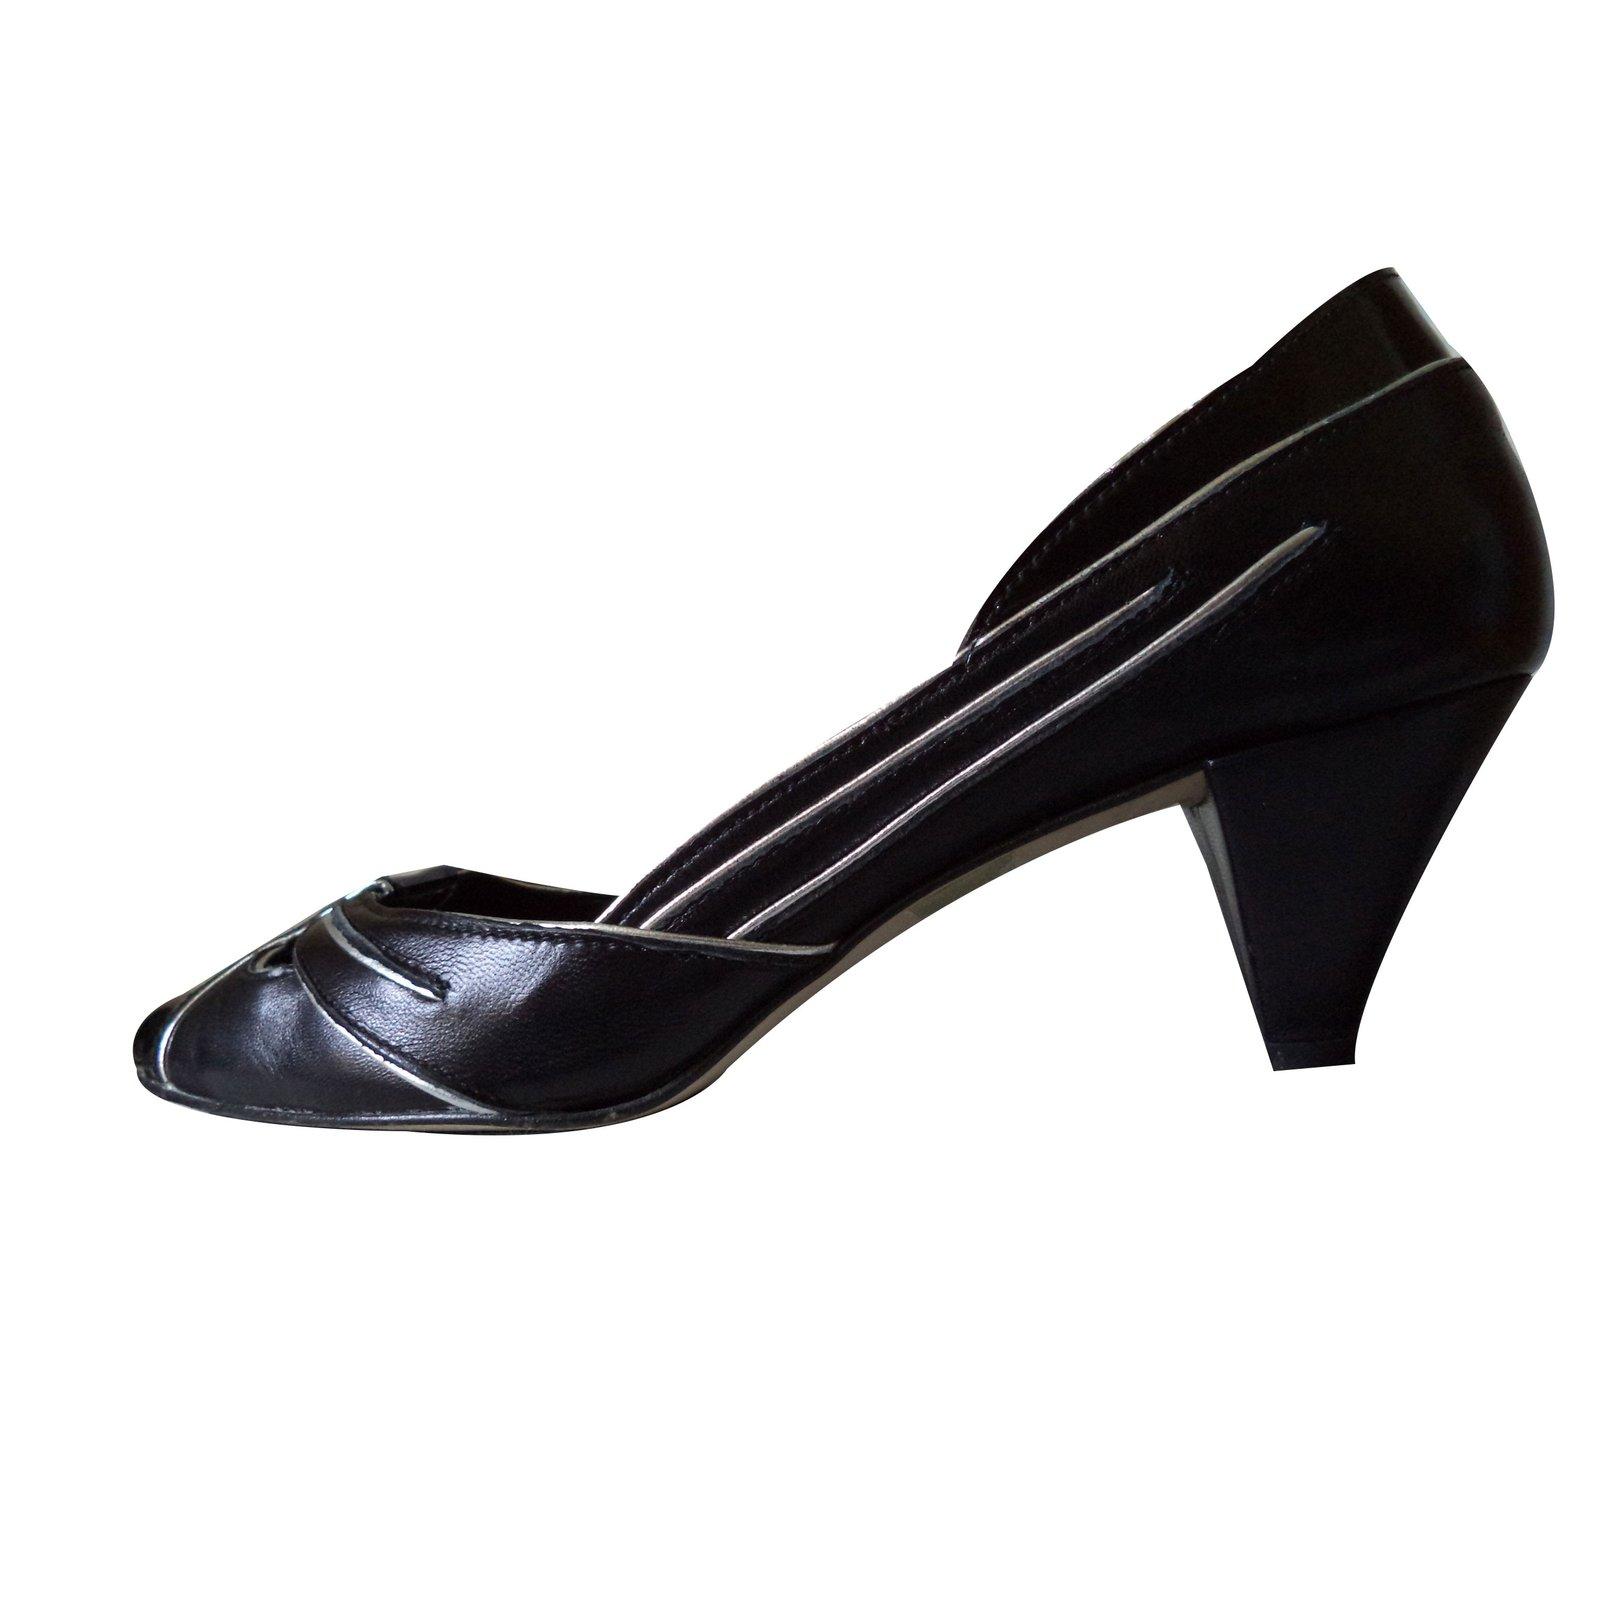 48cac77169a1 Gaspard Yurkievich Kitten Heel Pumps Heels Patent leather Black ref.49644